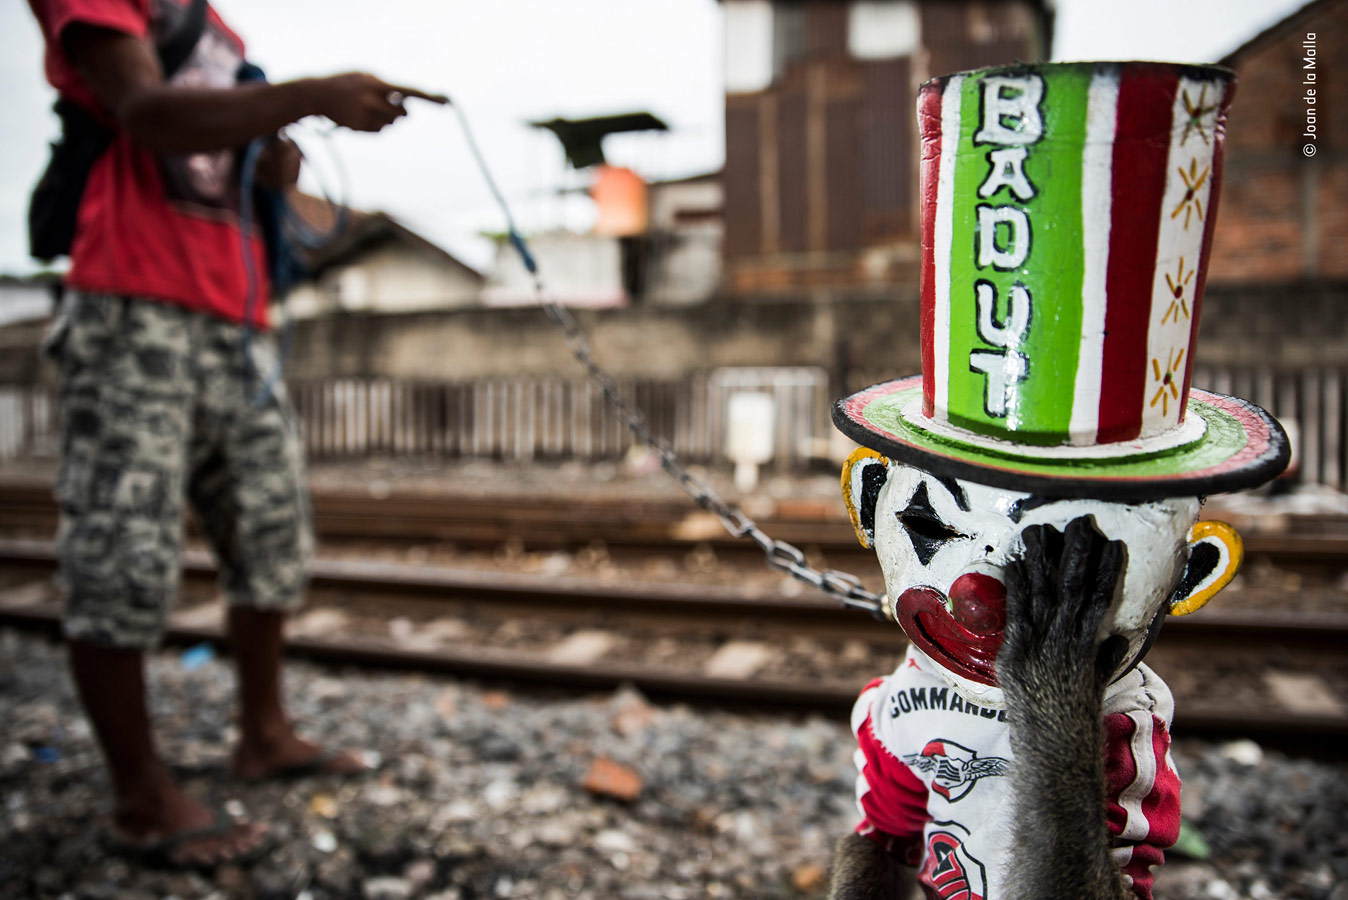 Wildlife Photojournalism Category Winner, The Sad Clown, © Joan de la Malla, Spain, Wildlife Photographer of the Year